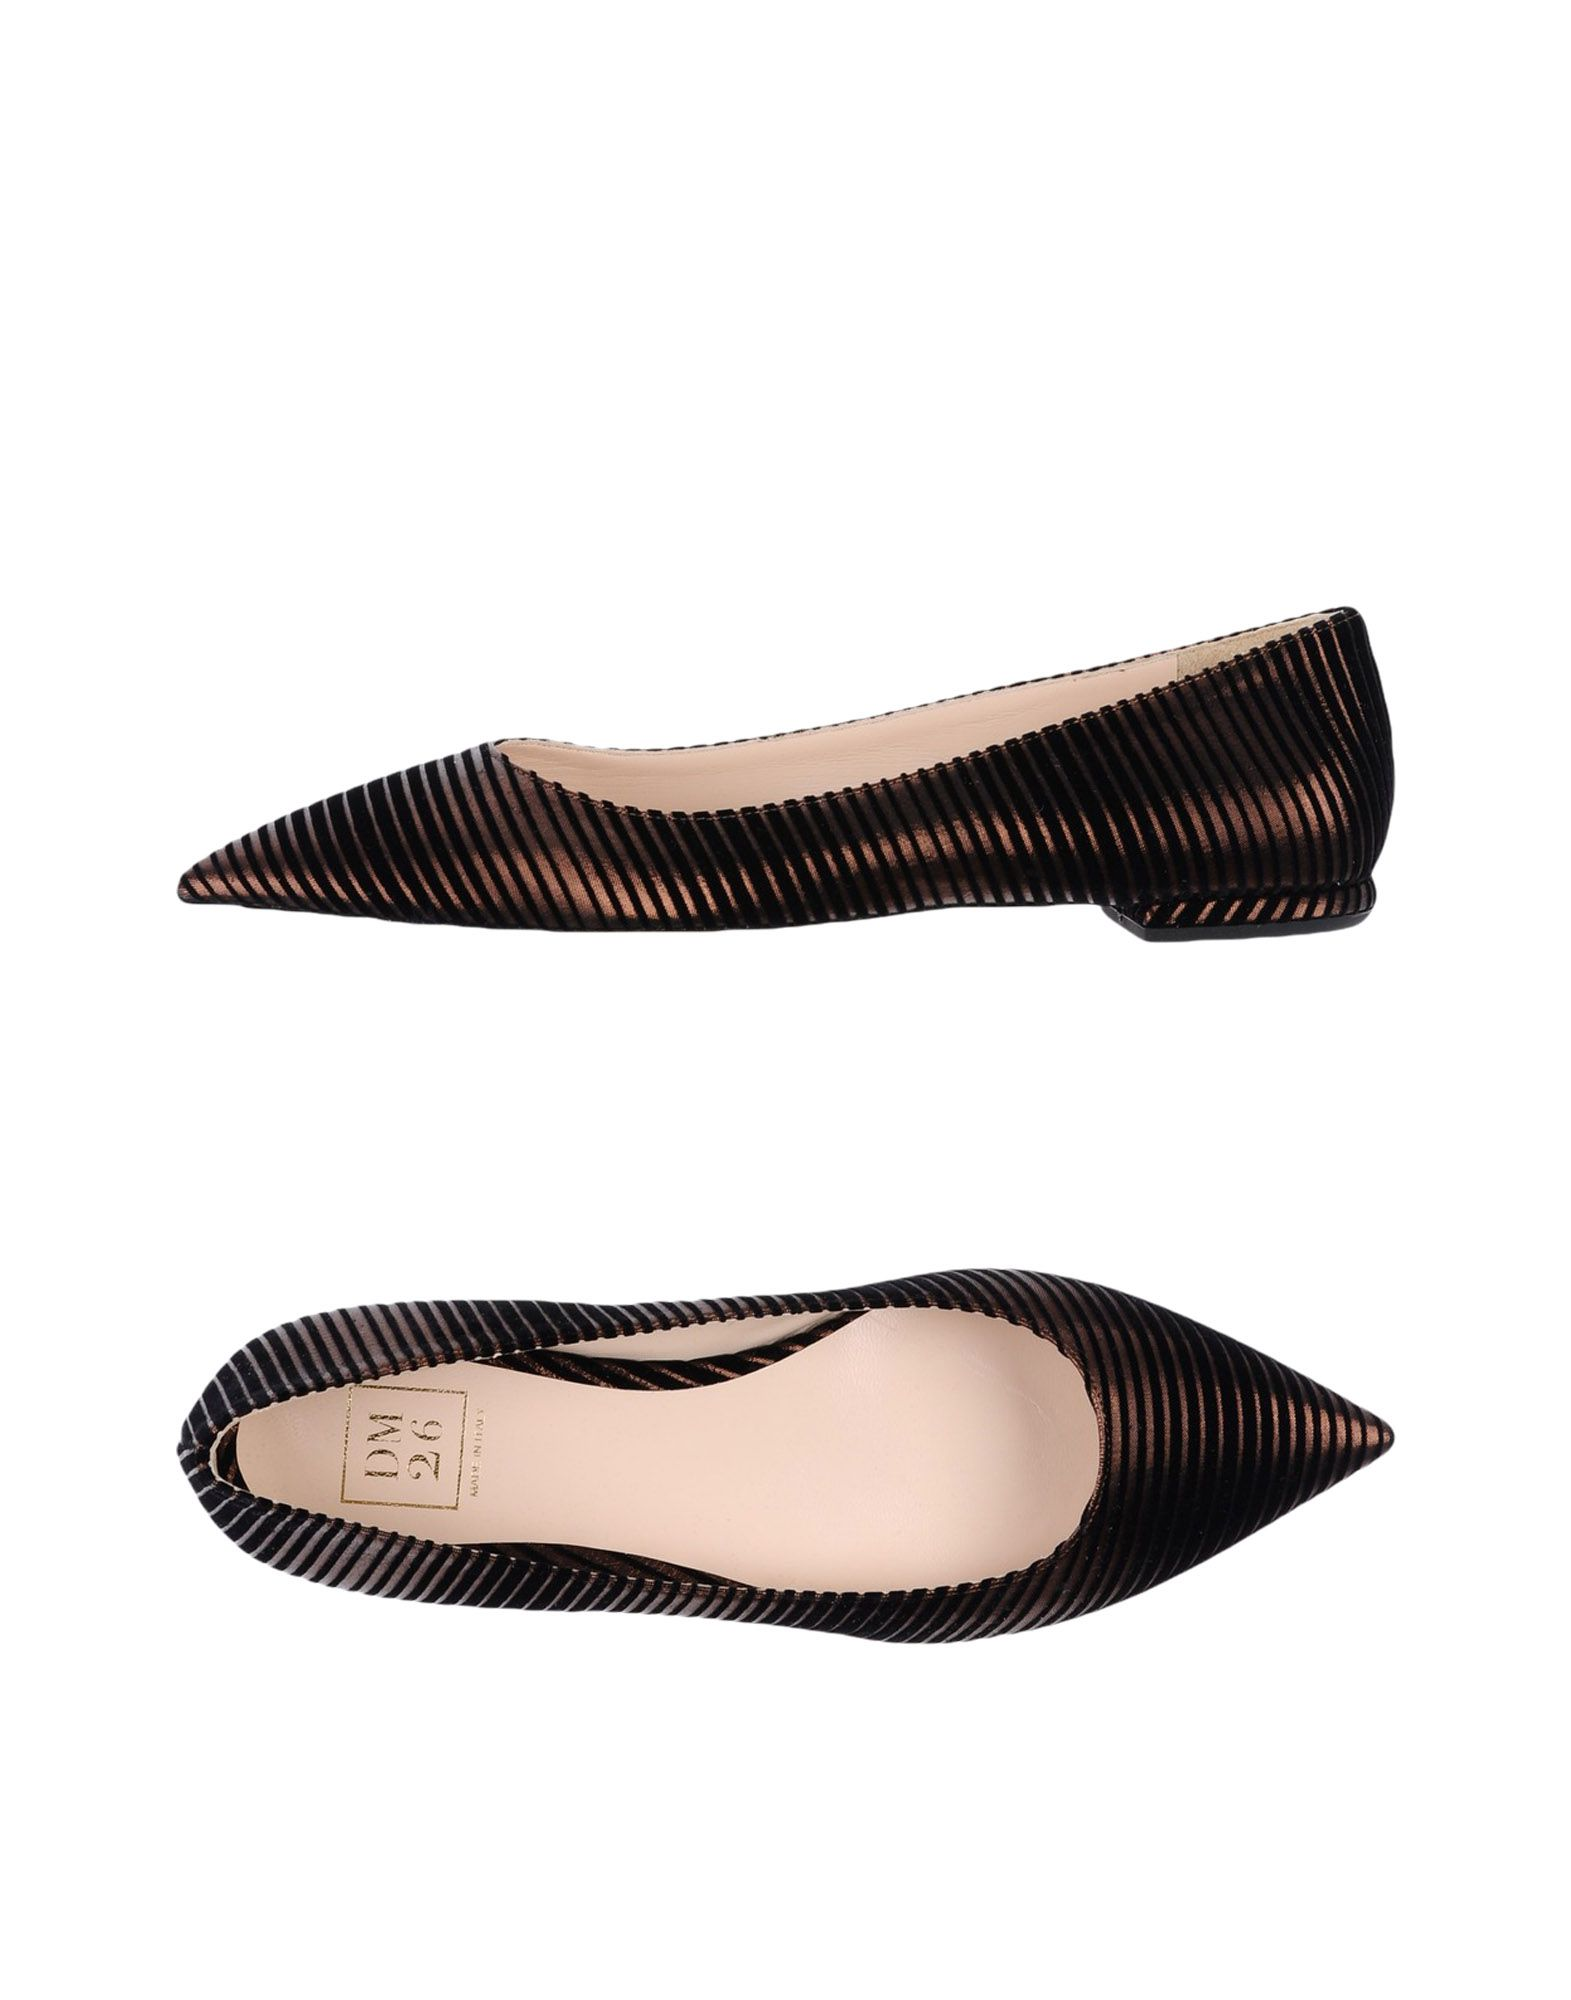 Dm26 Ballerinas Damen  11360868QO Gute Qualität beliebte Schuhe